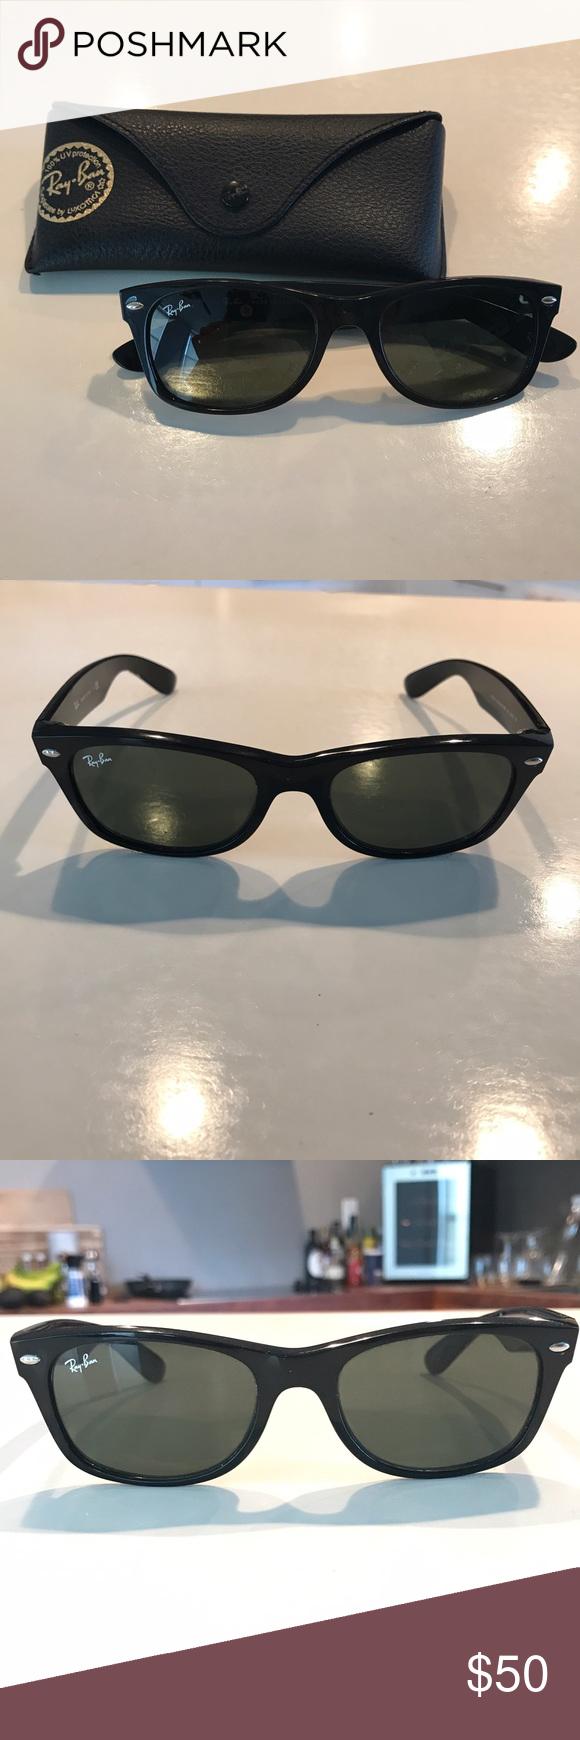 a21e7d7750 Black Ray-Ban wayfarer (small frame) sunglasses Black Ray-Ban sunglasses. Wayfarer  small frame style. Black lens and black frames. No scratching.